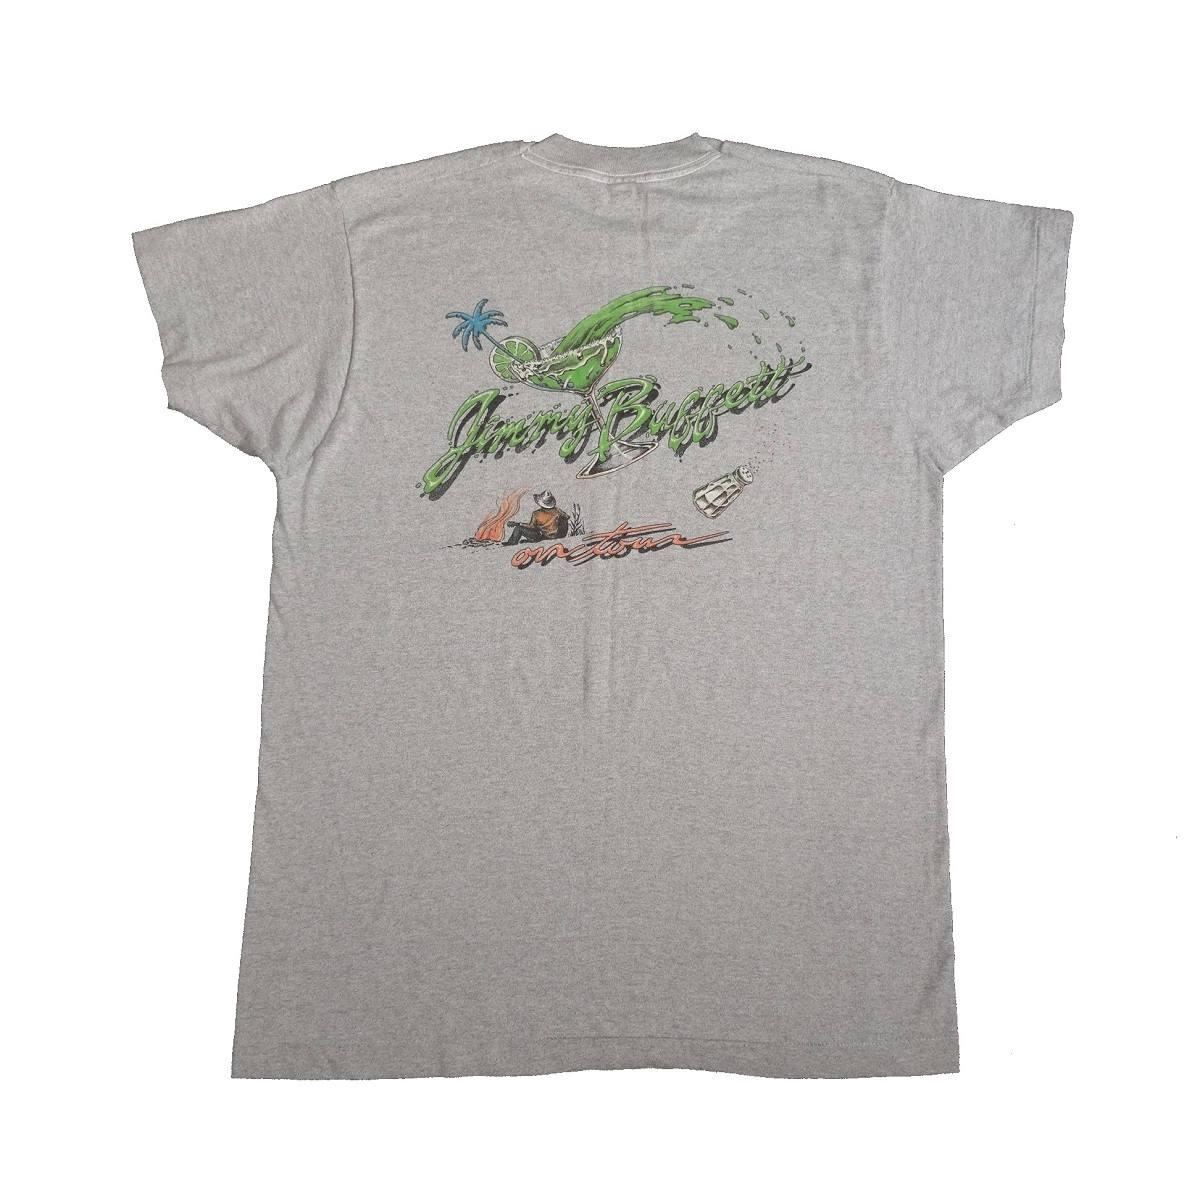 jimmy buffett last mango in paris tour vintage 80s t shirt back